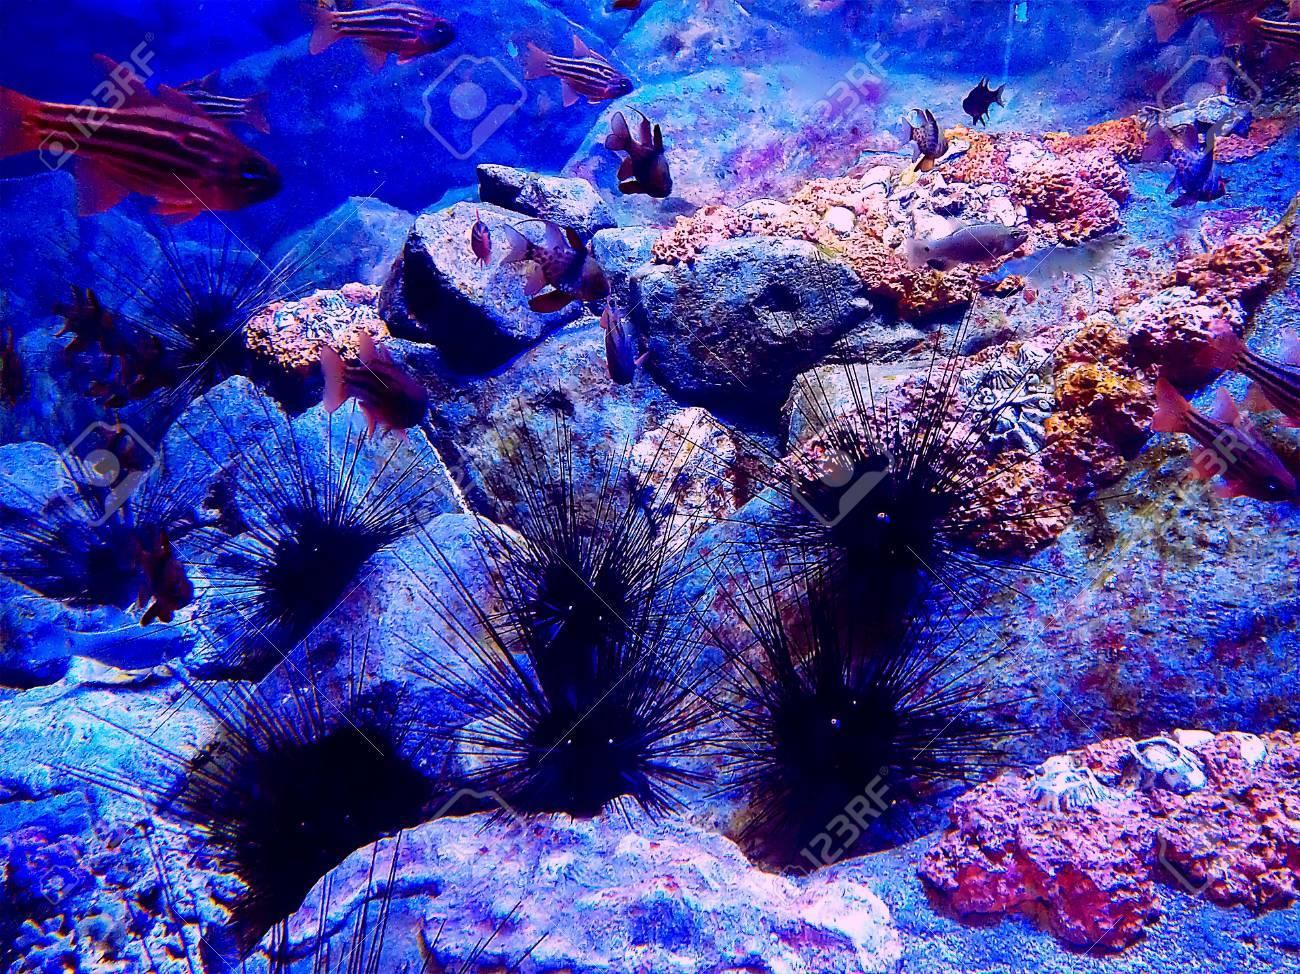 Sea urchins in an aquarium Stock Photo - 18970279